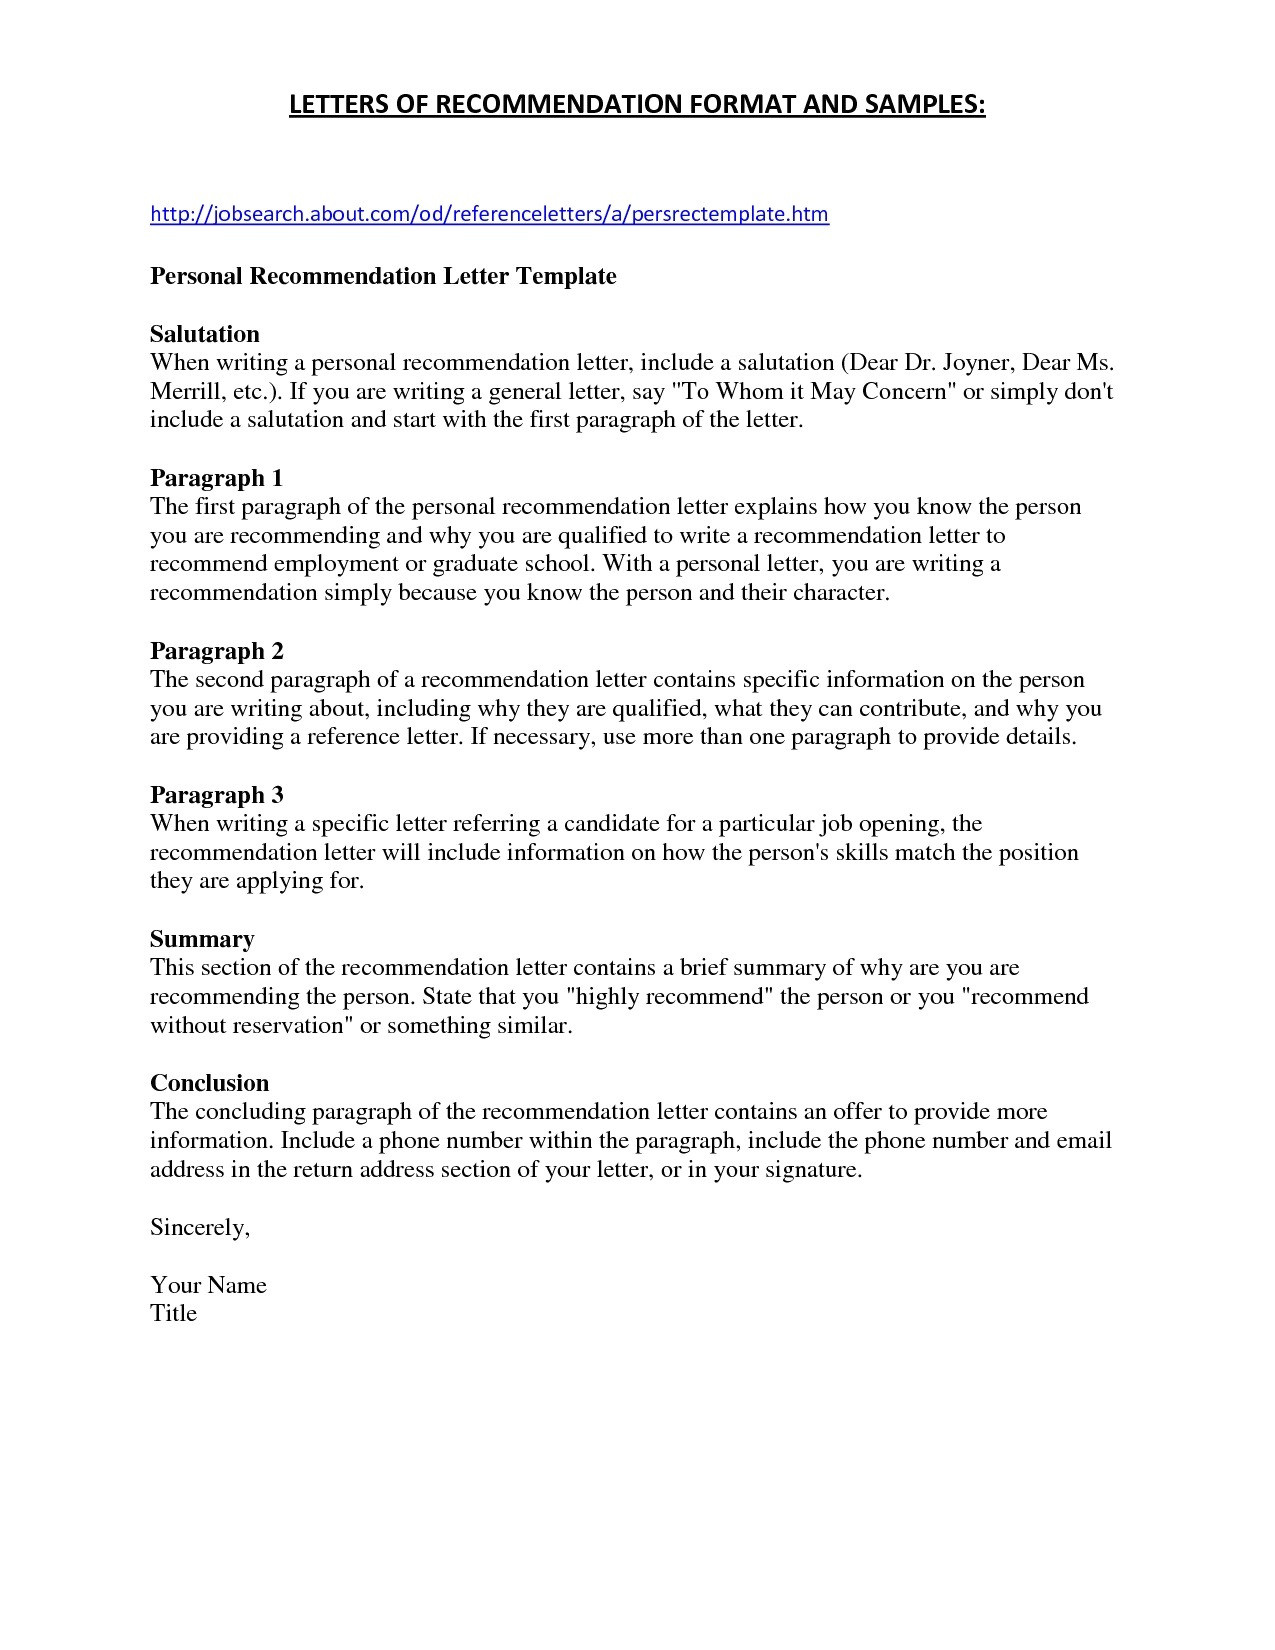 Ssis Design Document Template Elegant Game Design Document Template Template